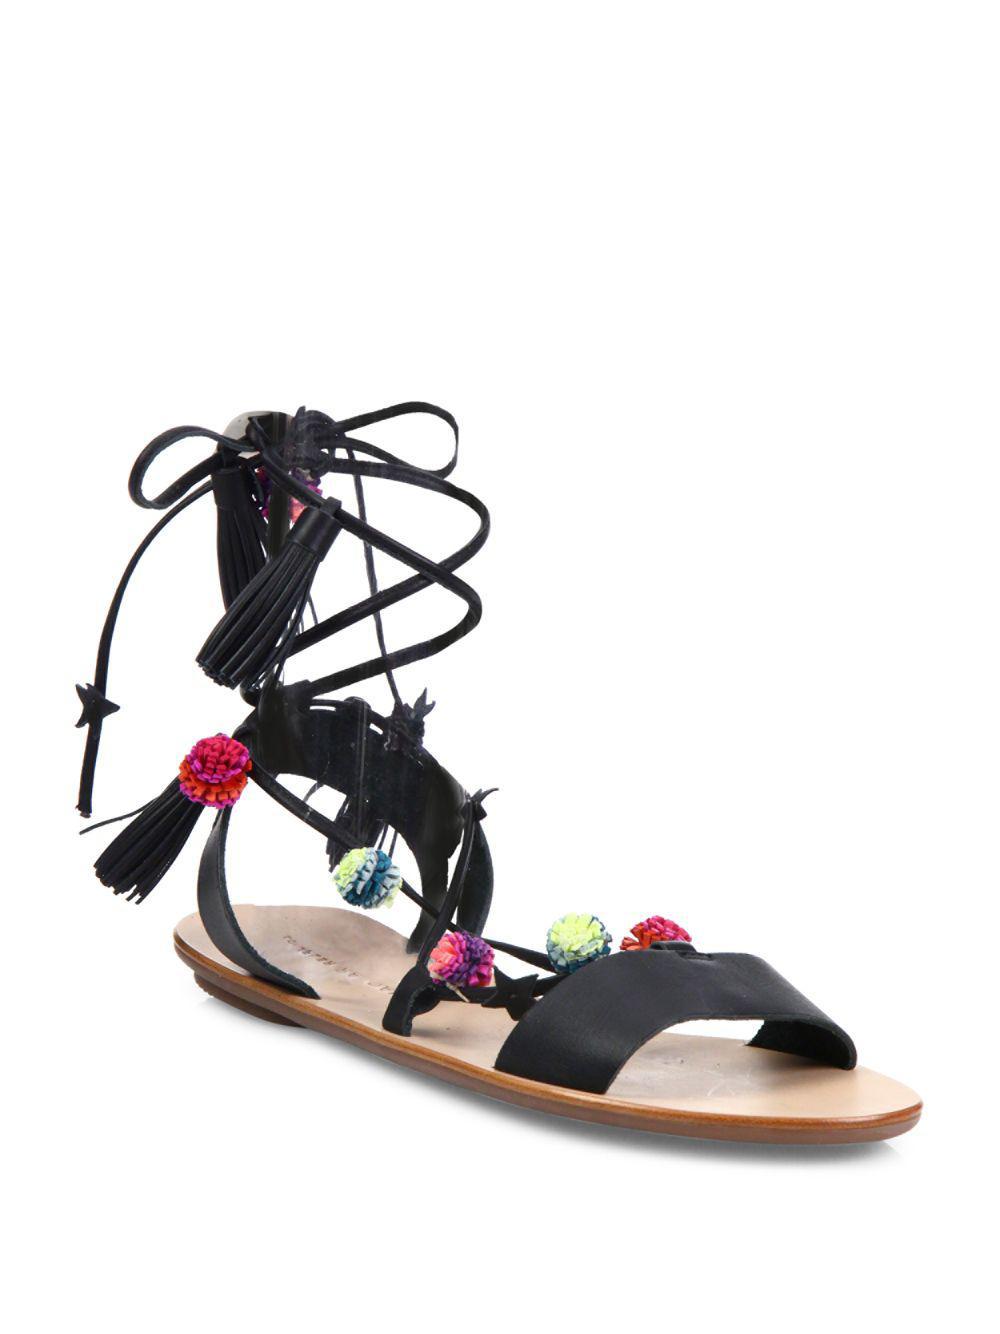 Lyst Loeffler Randall Suze Pom Pom Tie Sandals In Black